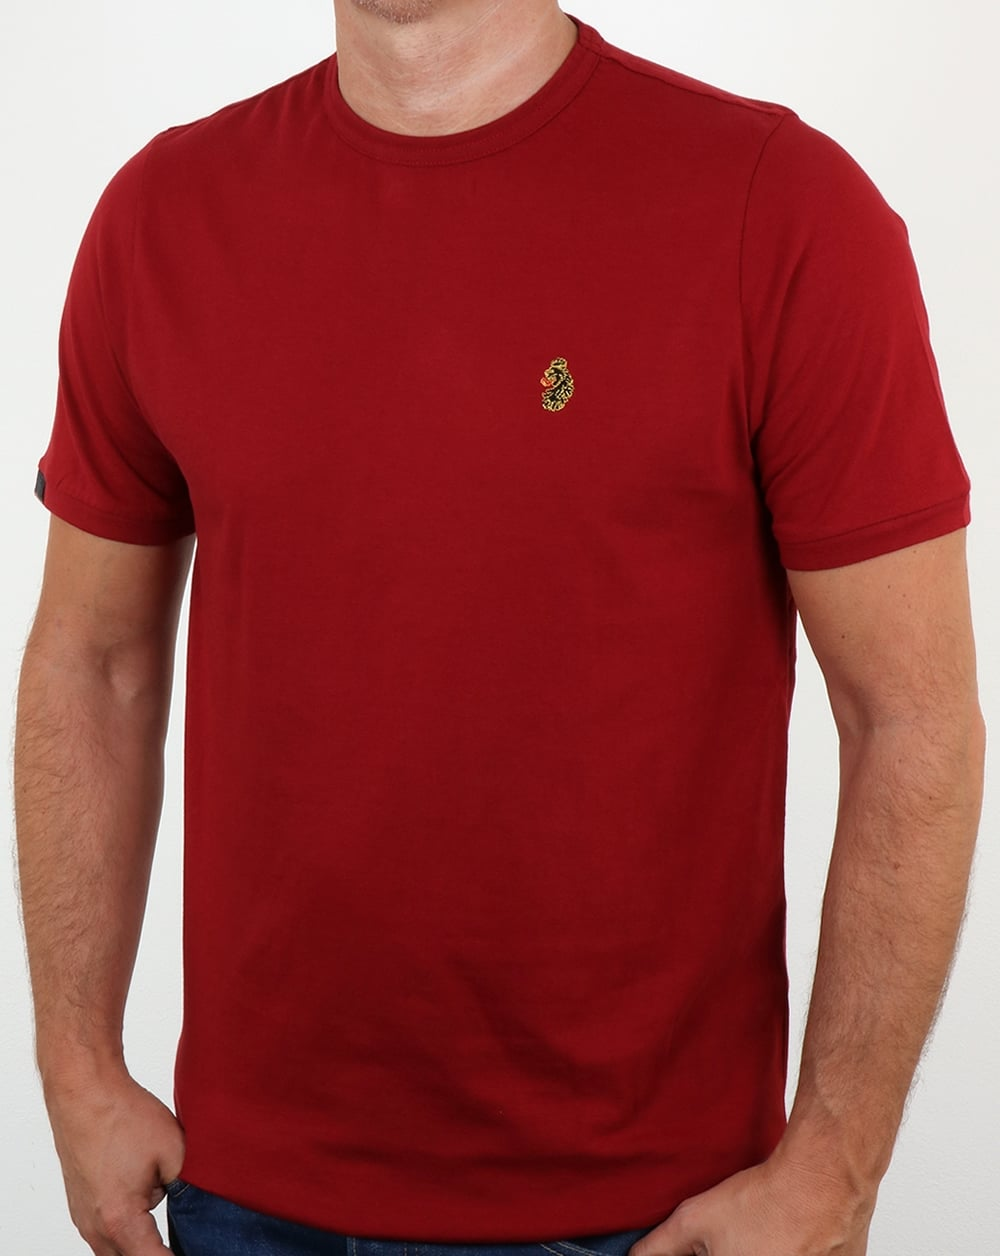 f006e91f Luke Traff T Shirt Cherry,tee,logo,crew neck,cotton,mens